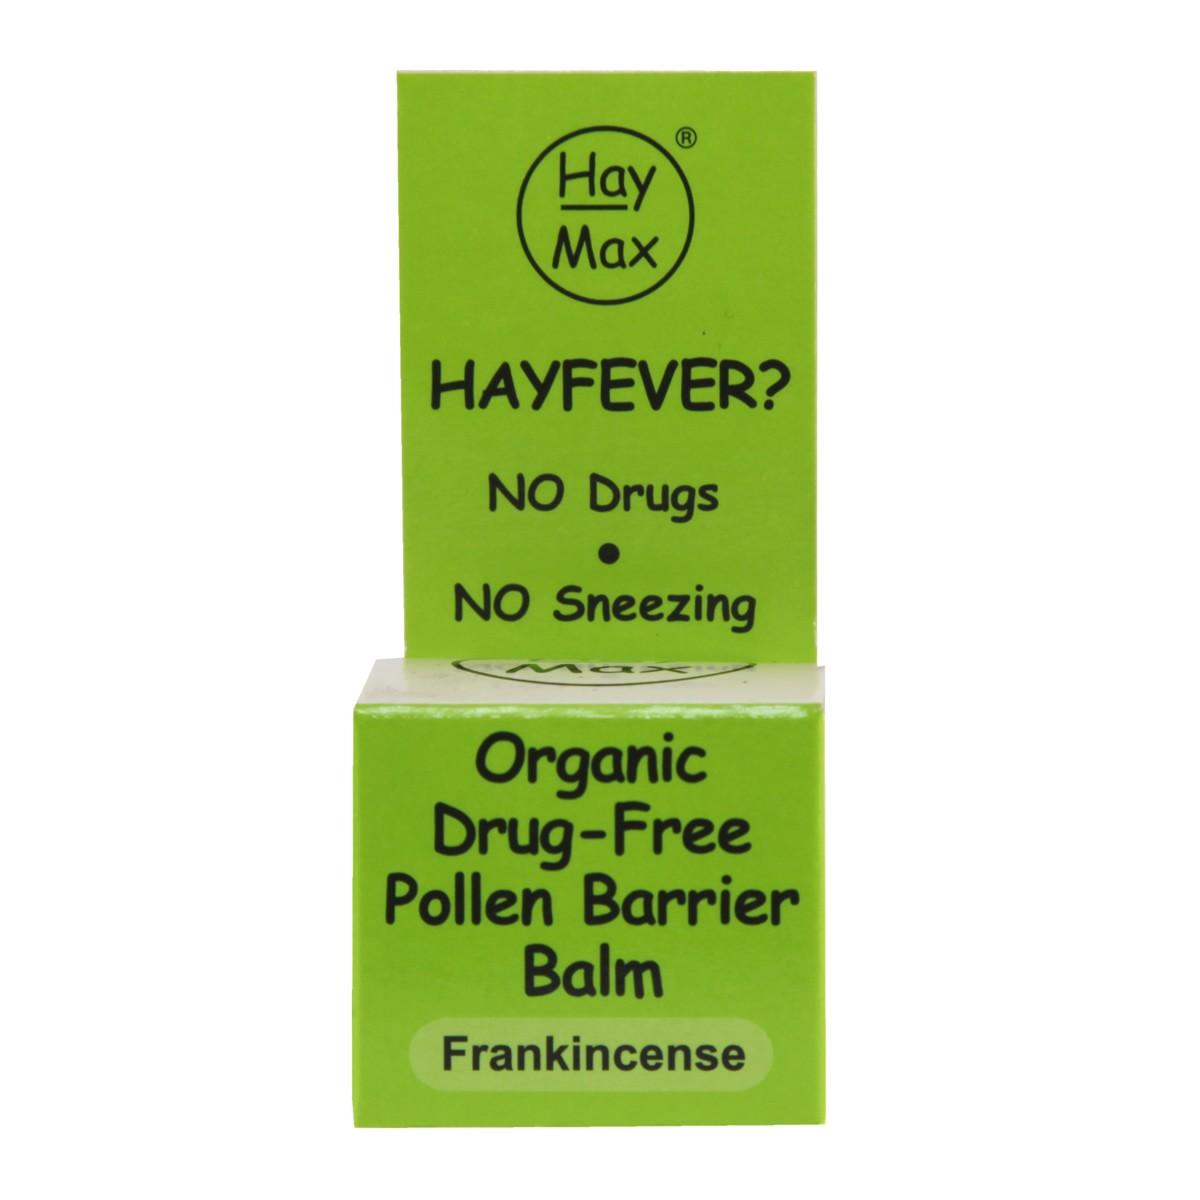 HayMax Organic Drug-free Pollen Barrier Balm - Frankincense